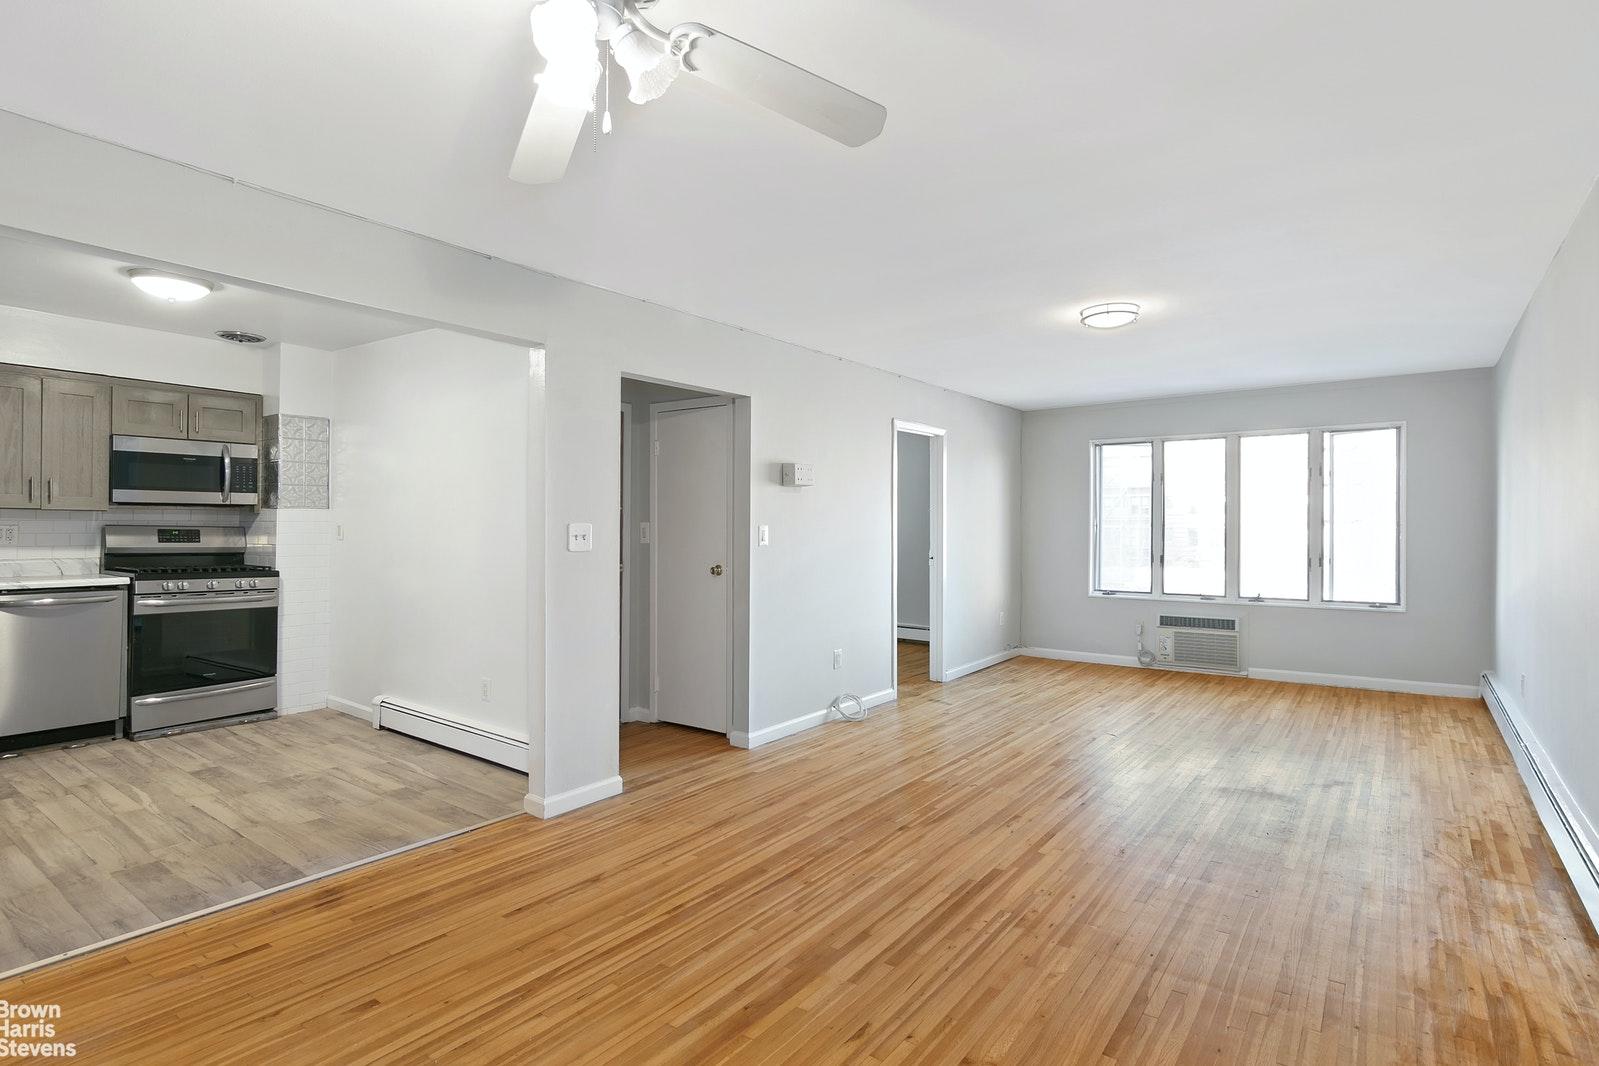 21 -15 32 STREET 3, Astoria, $3,500, Web #: 20323040